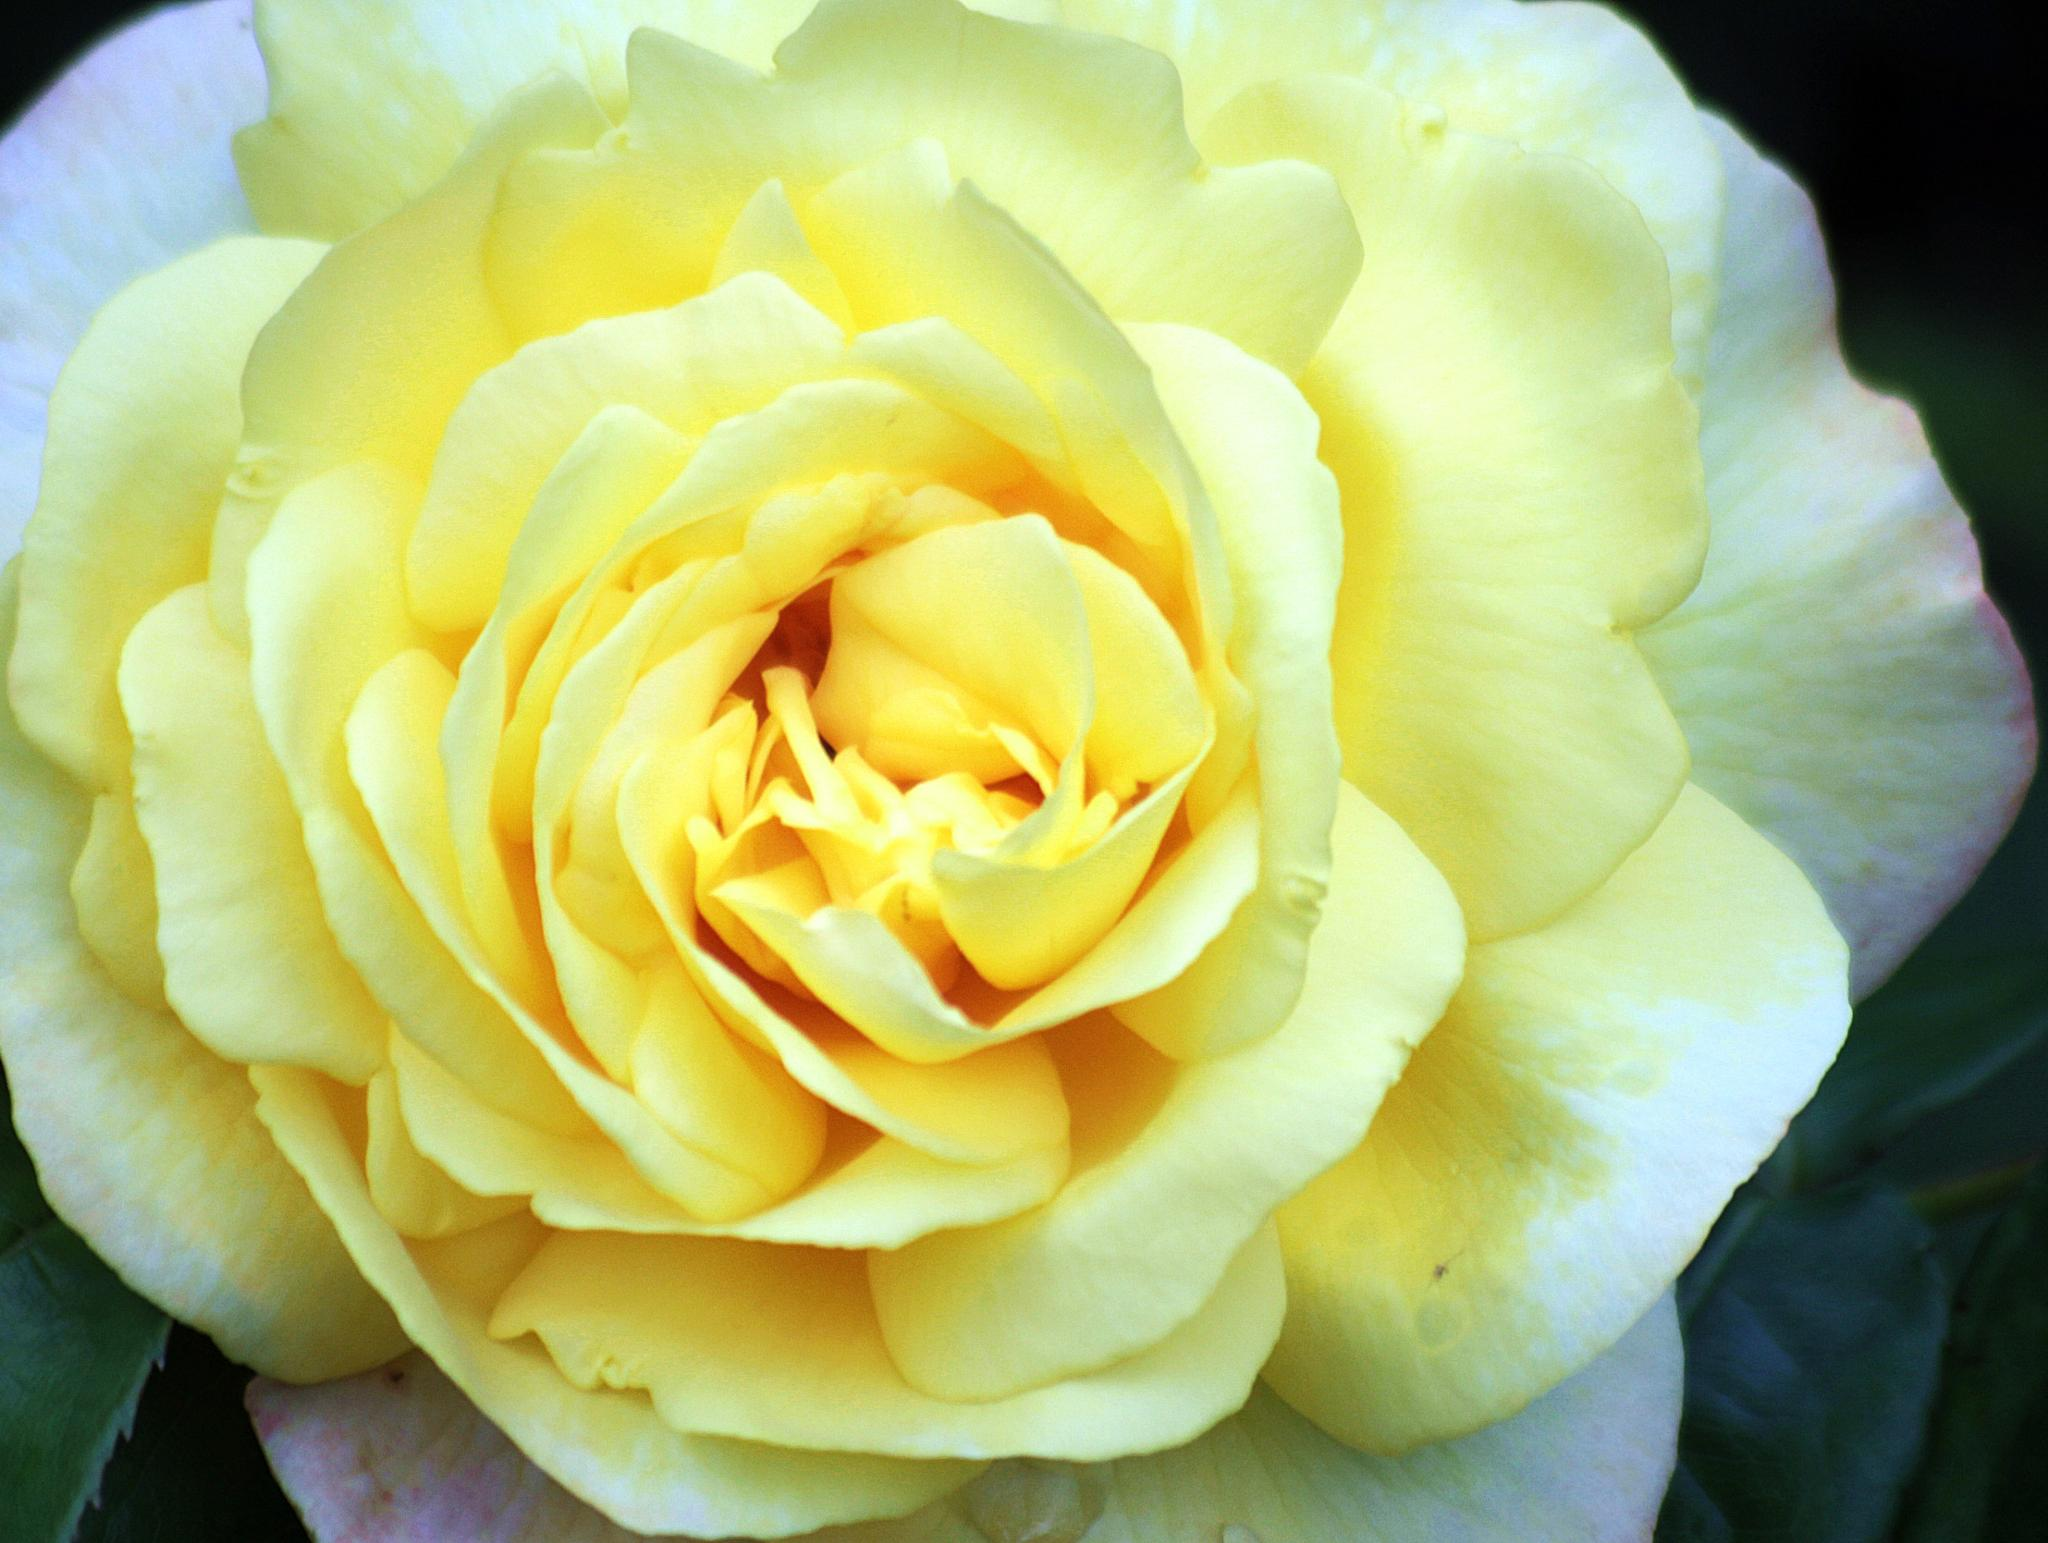 yellow rose by gavin holloway